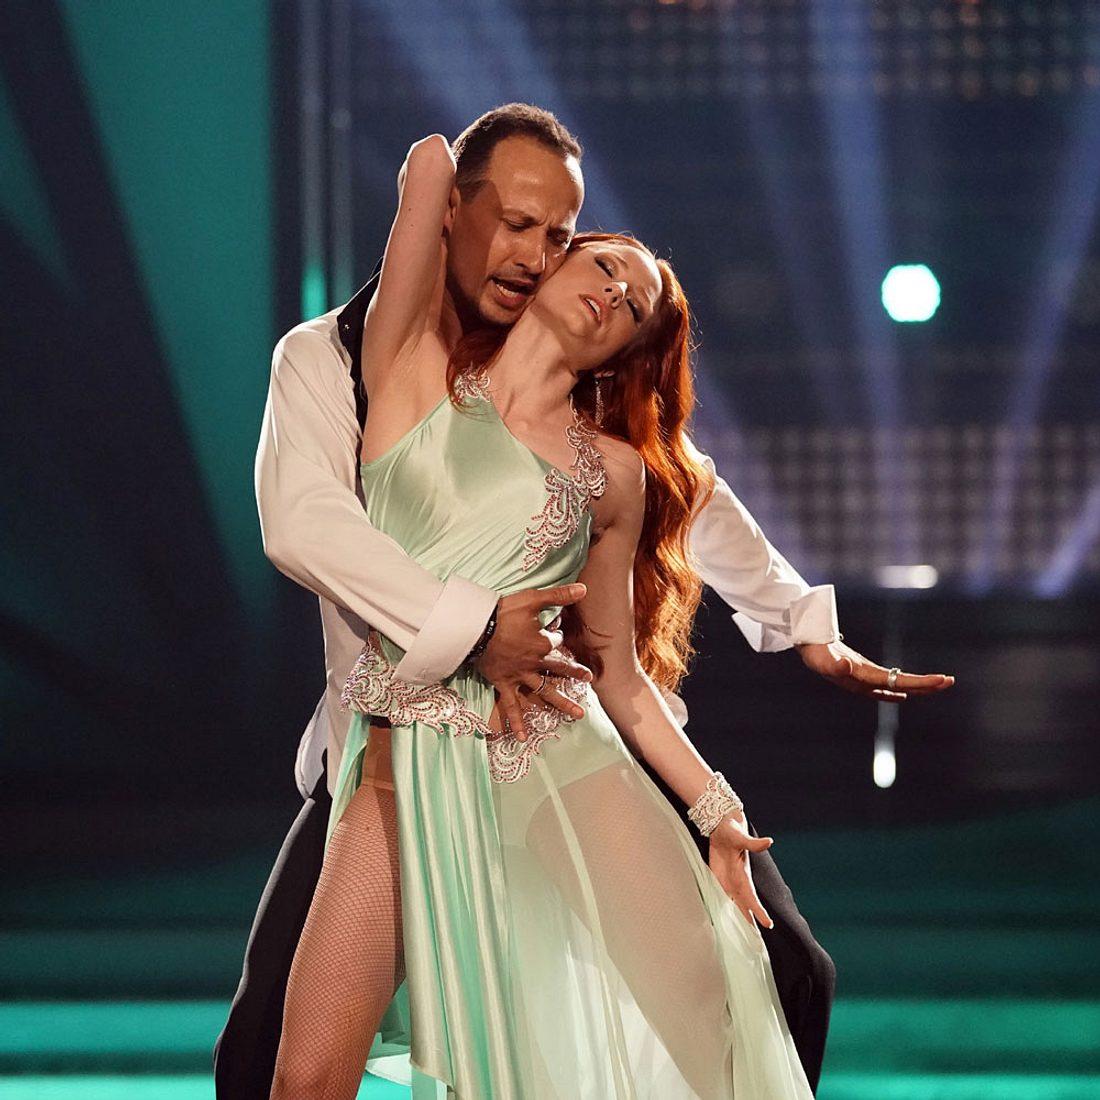 Barbara Meier Let's Dance 2018 Sergiu Luca